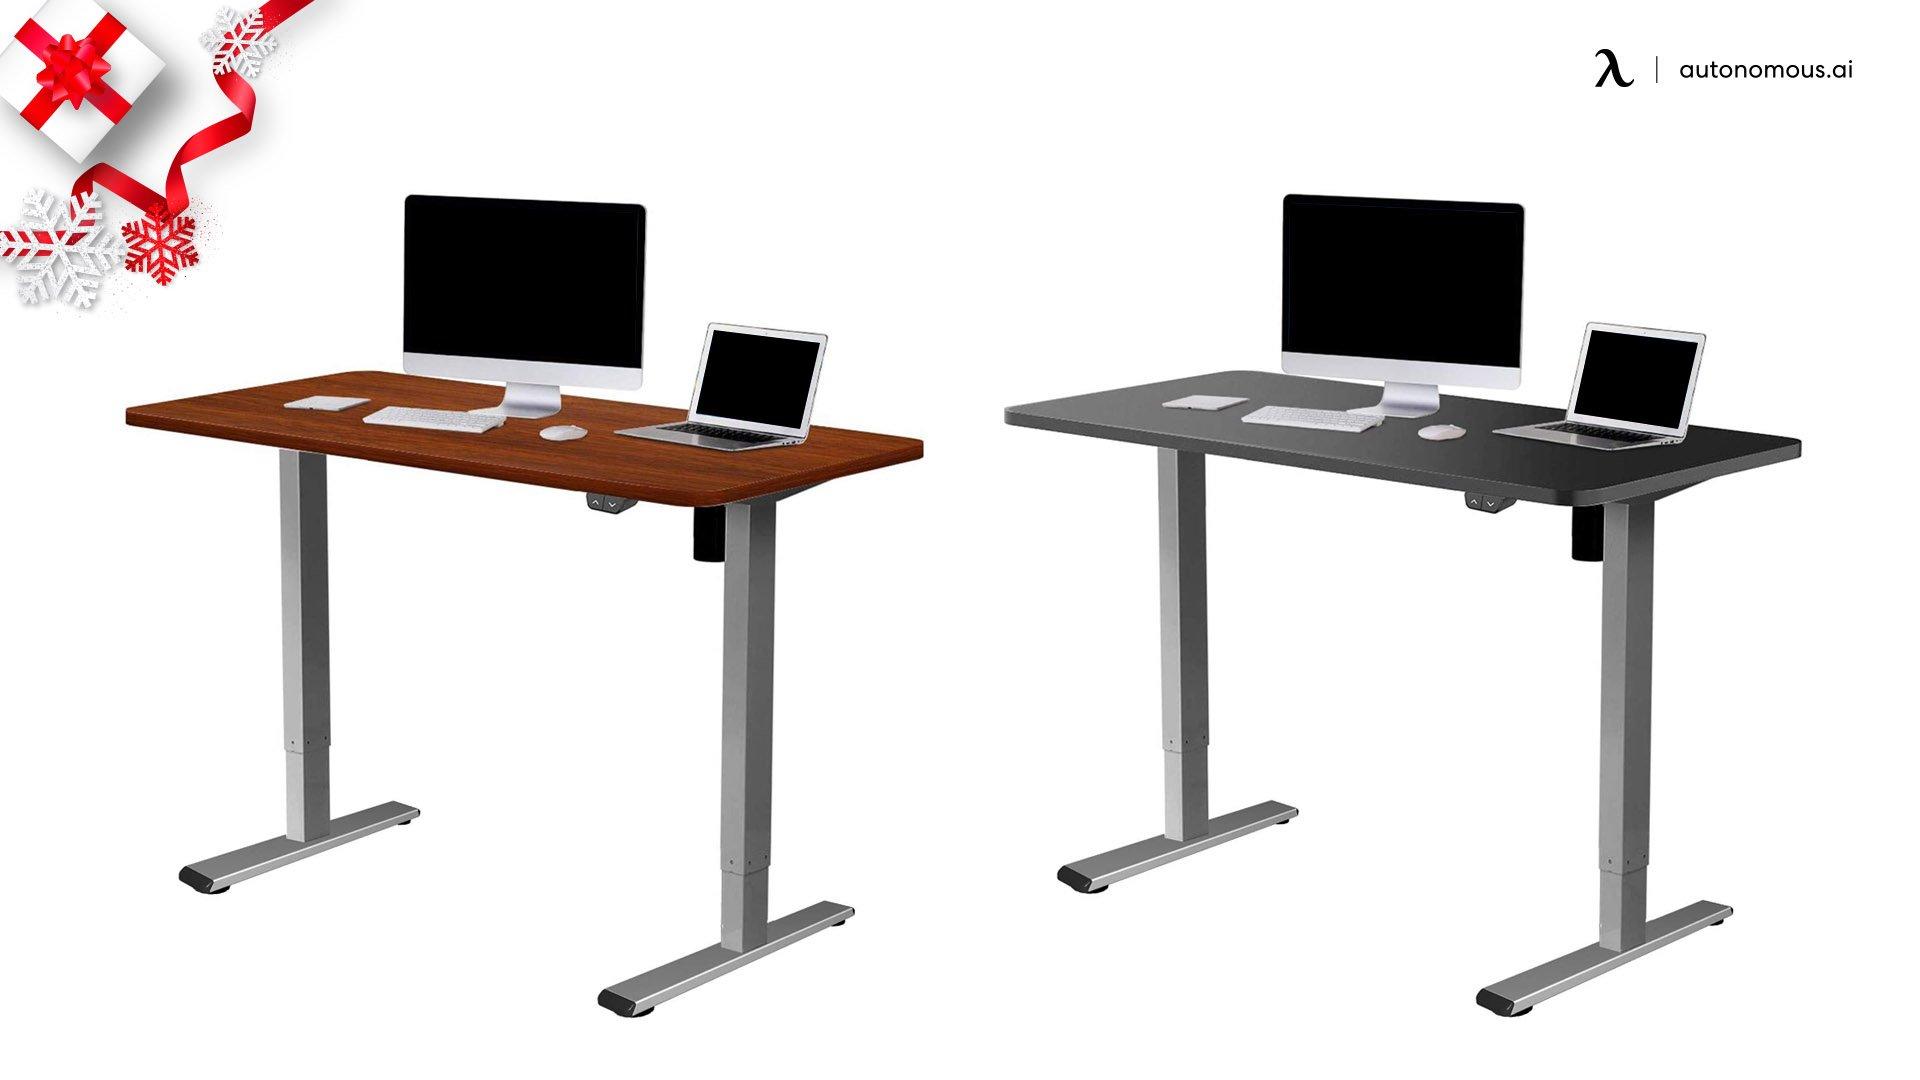 Adjustable Standing desk by Flexipot